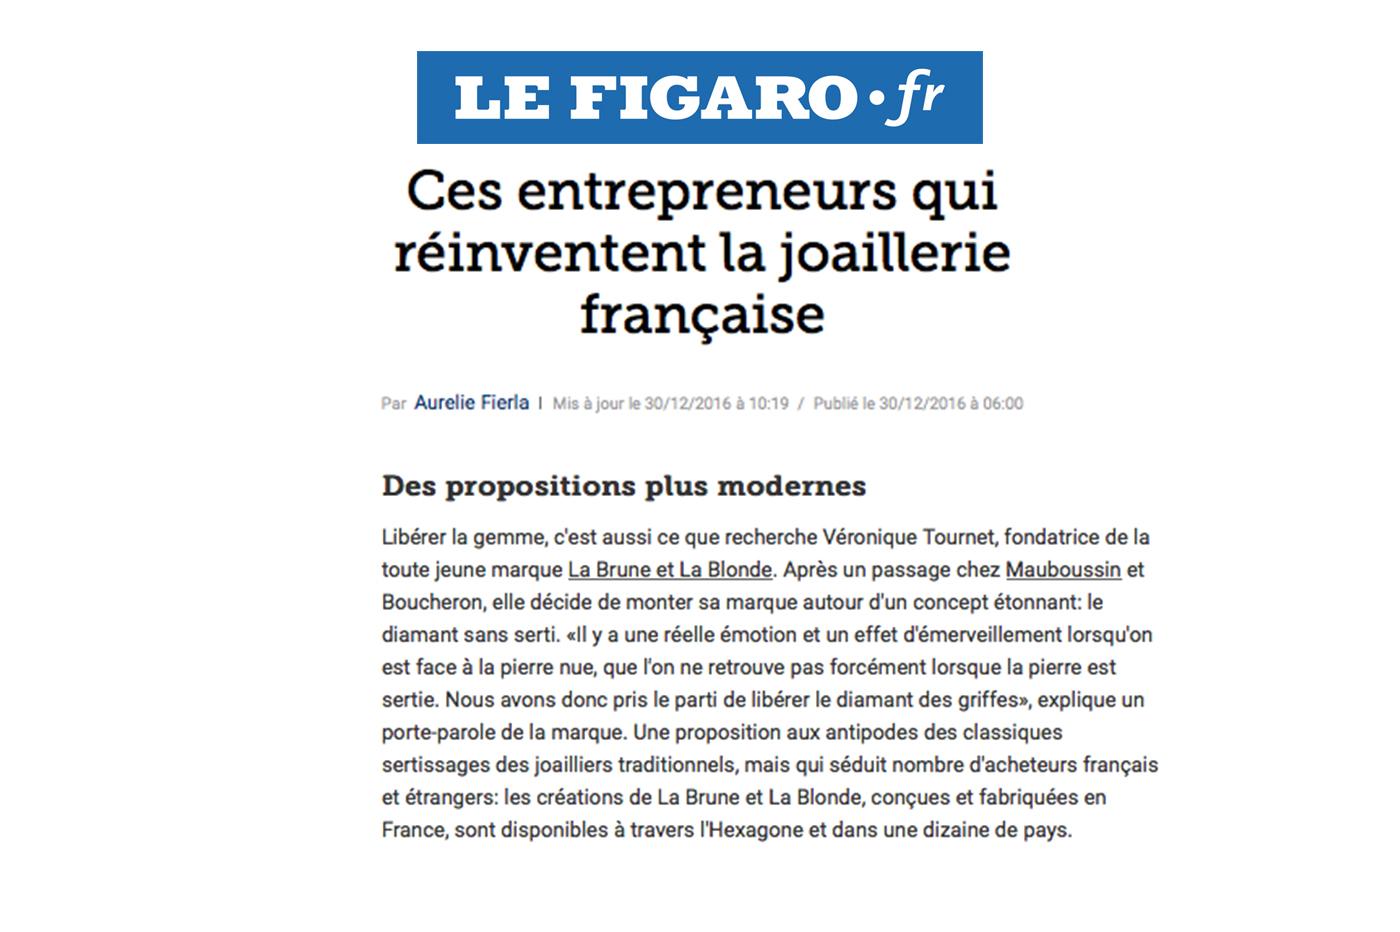 DISRUPTING THE CODES! – LEFIGARO.FR